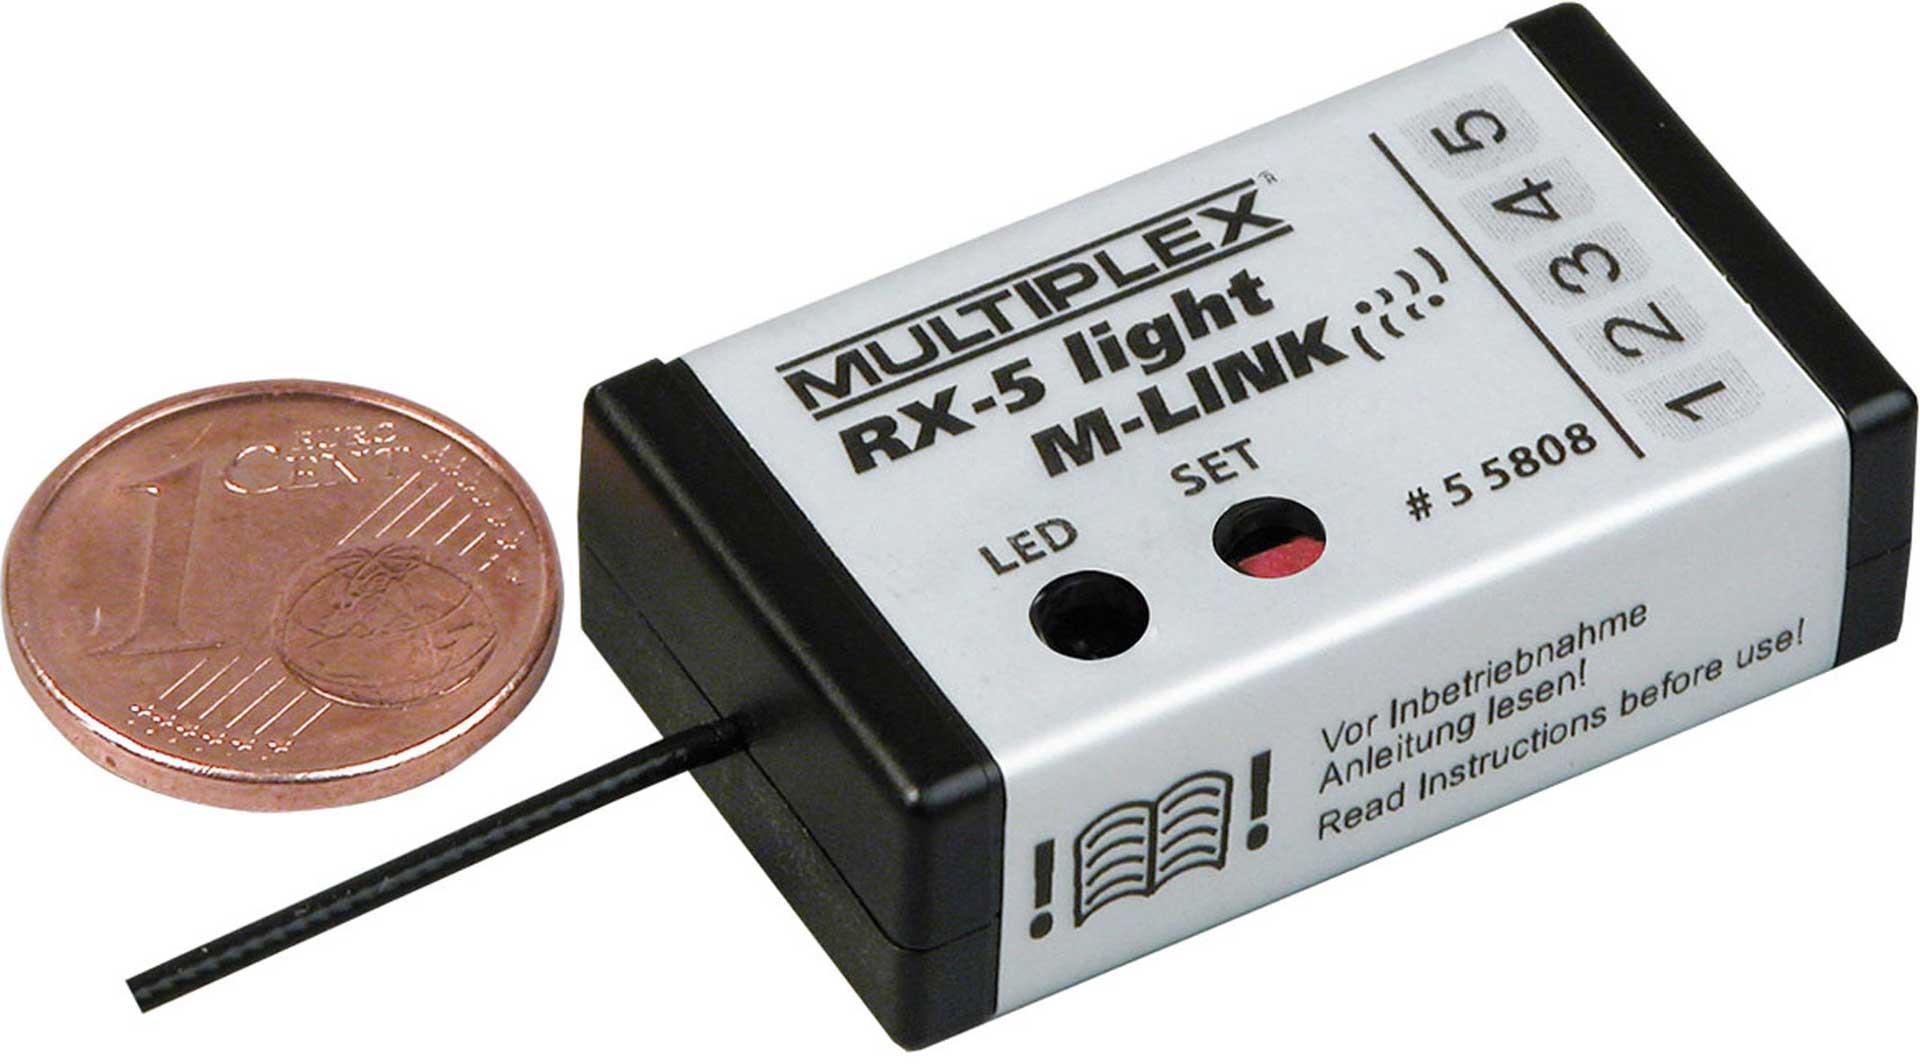 MULTIPLEX RX-5 LIGHT 2.4GHZ M-LINK RECEIVER MPX